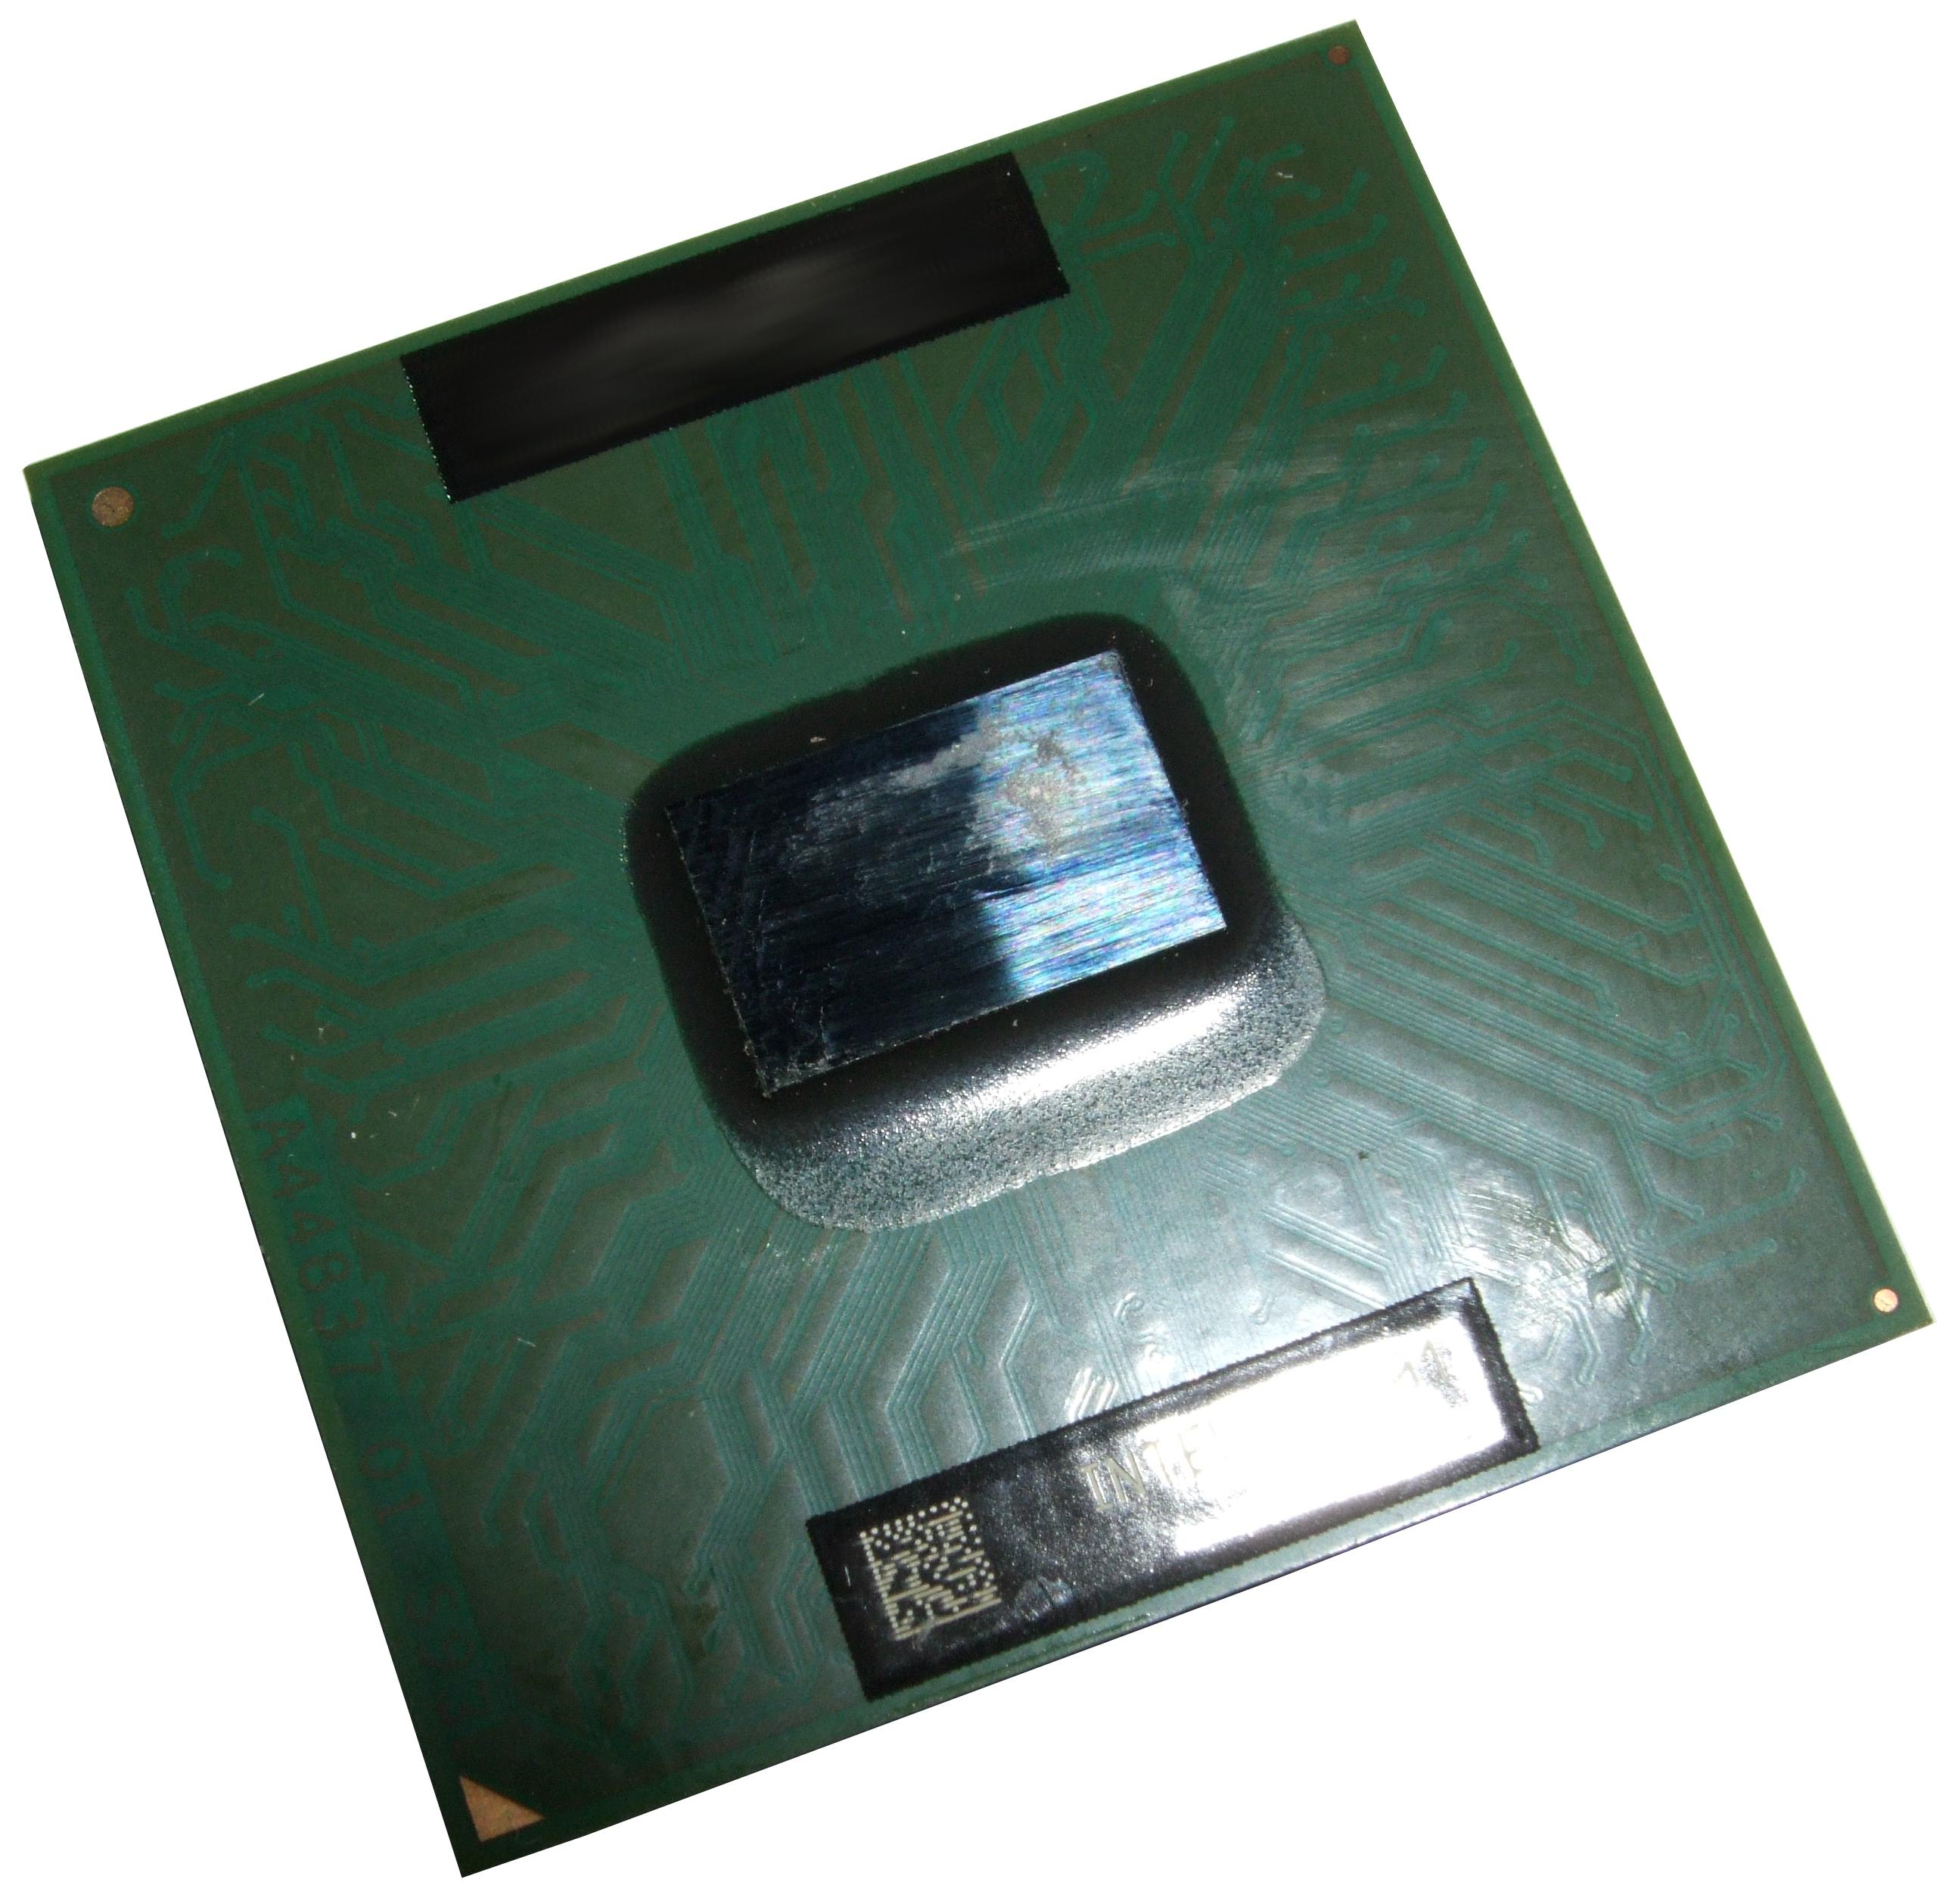 SLA2G Intel Celeron M Mobile 530 1.73GHz/1M/553 Socket P